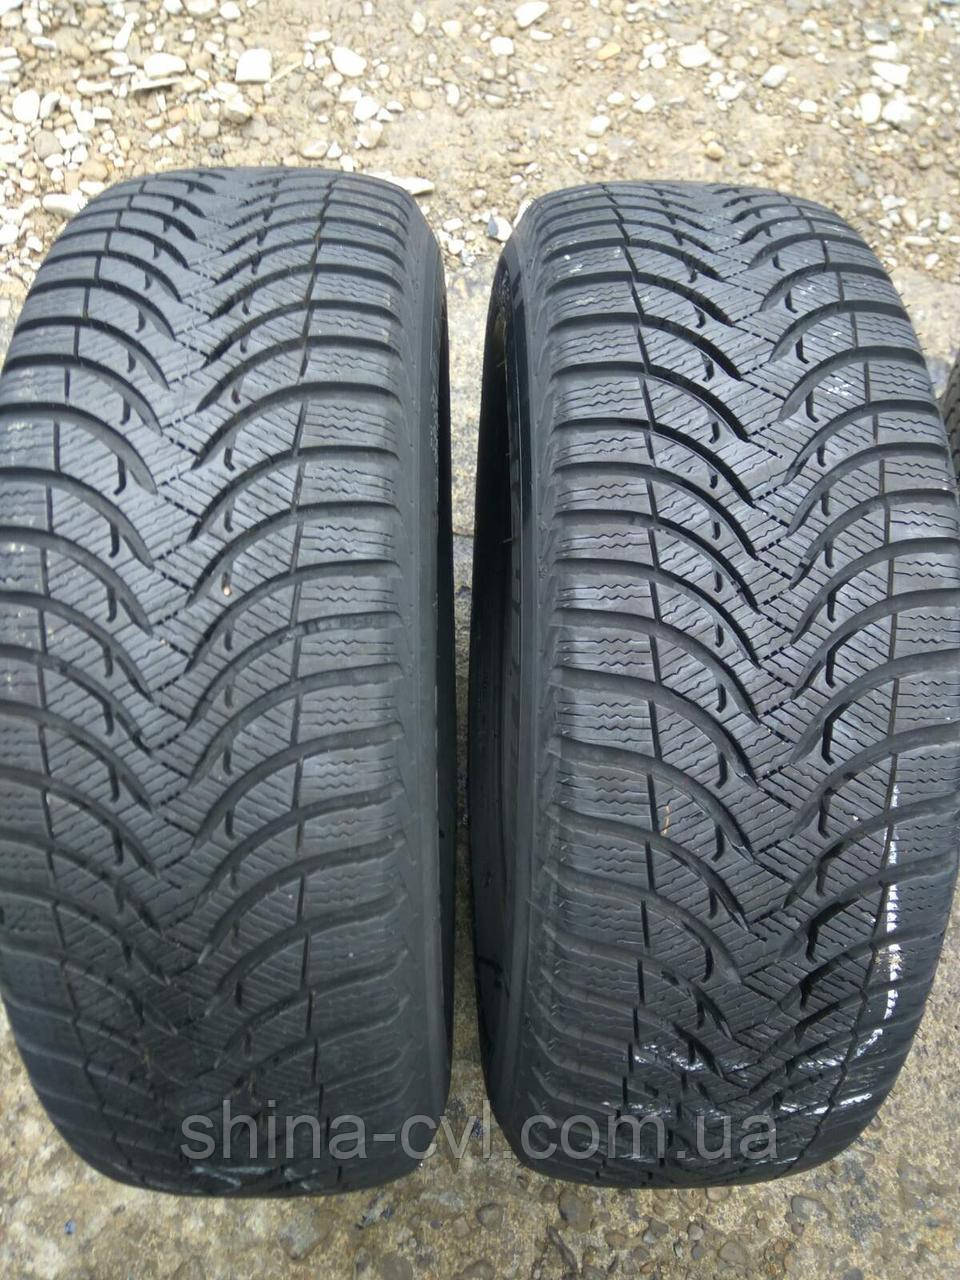 Зимові шини 215/65 R16 MICHELIN ALPIN A4